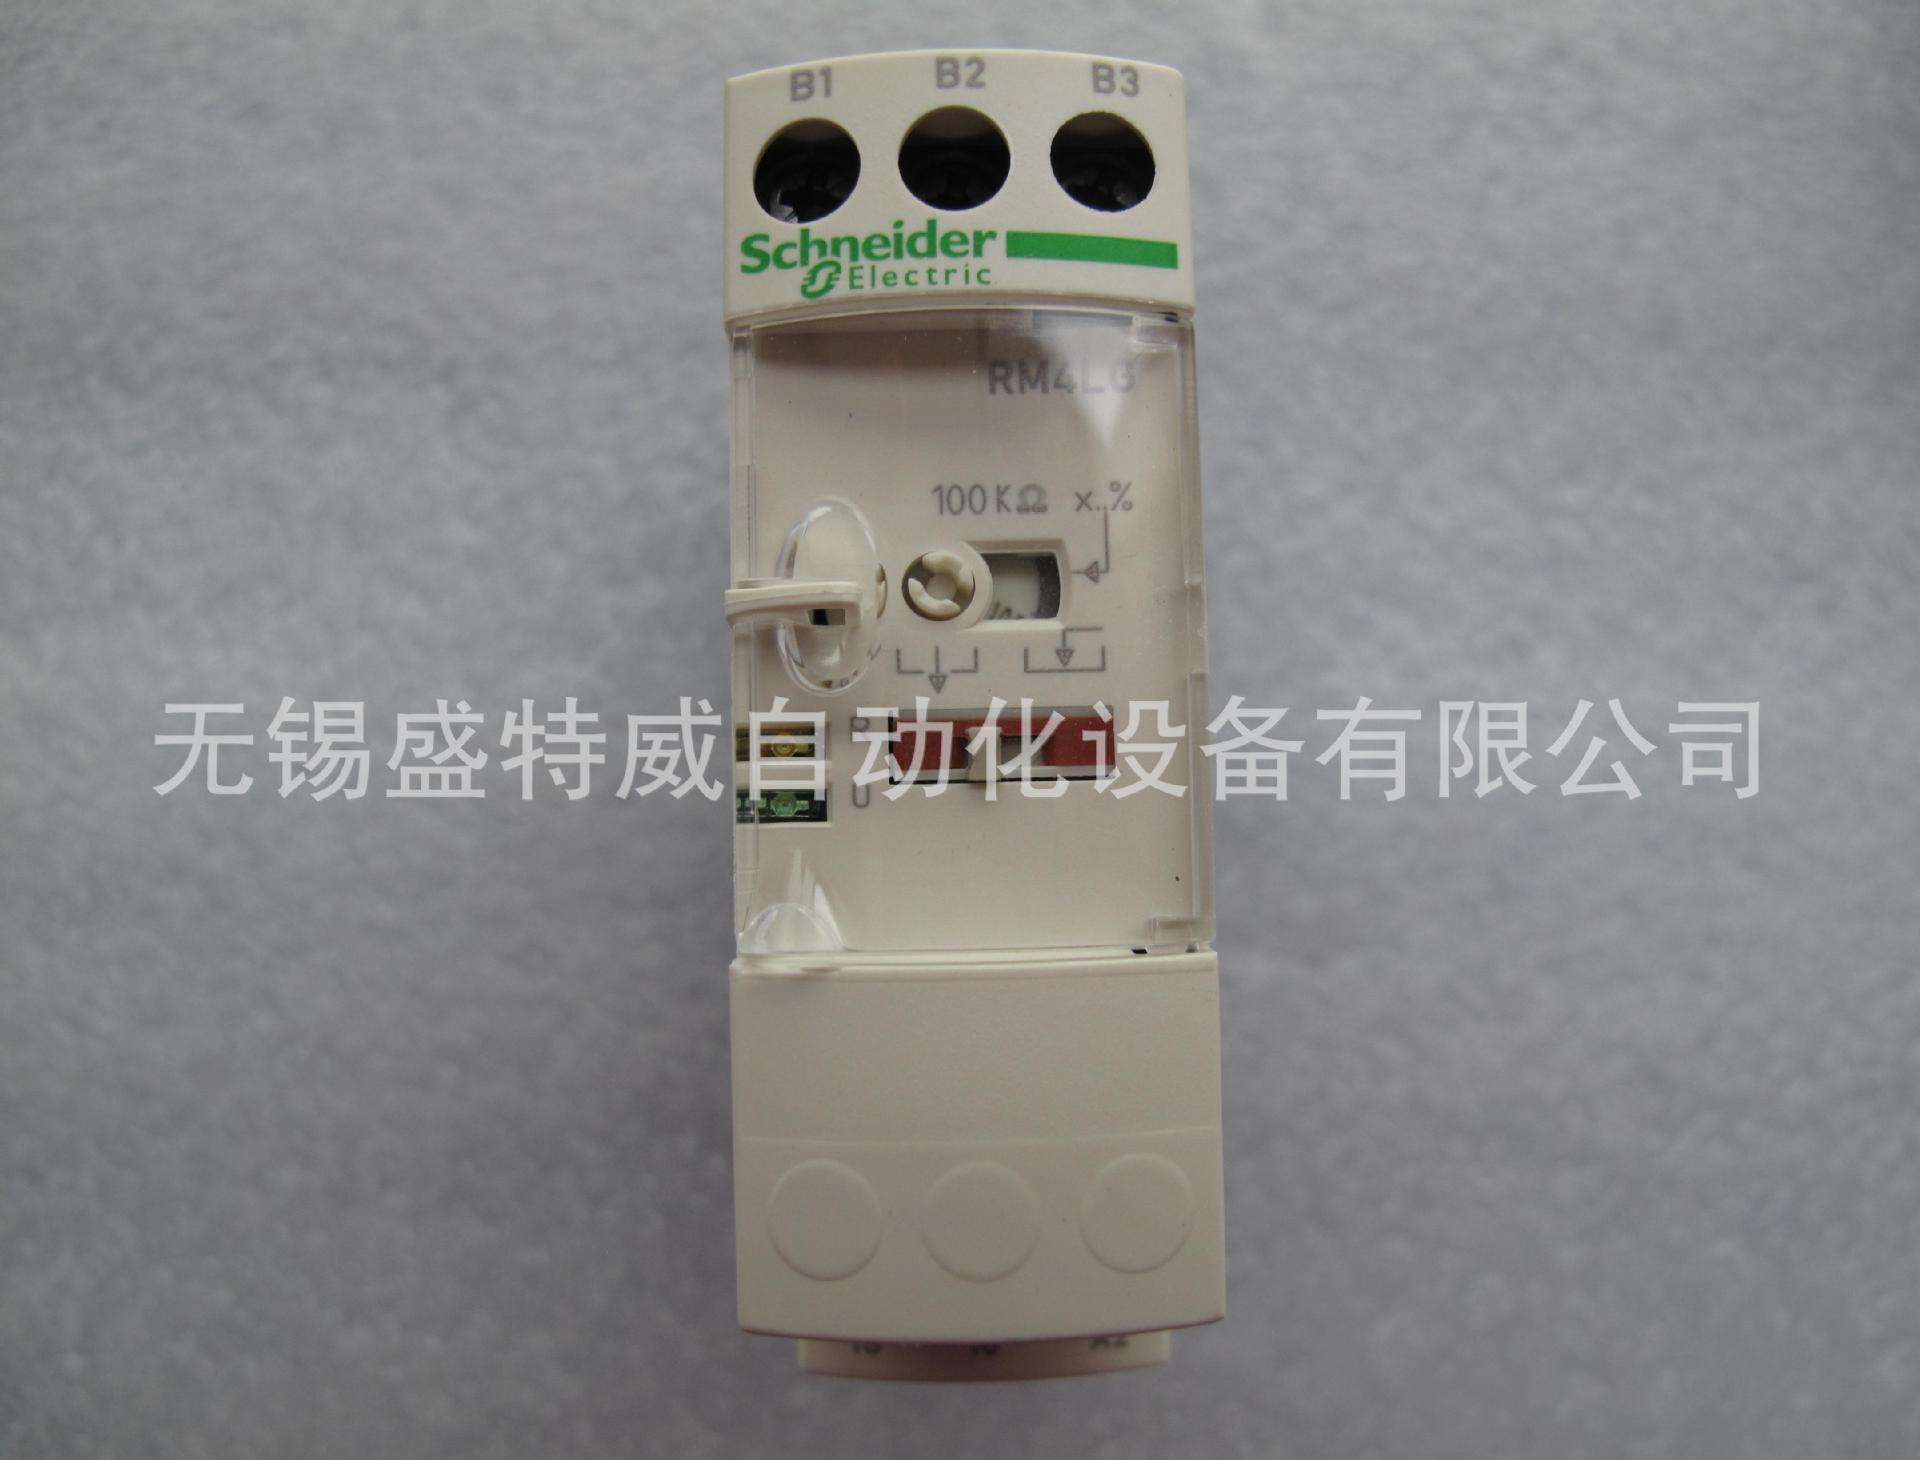 Schneider Liquid Level Control Relay Injection Or Empty Under Current Undefined